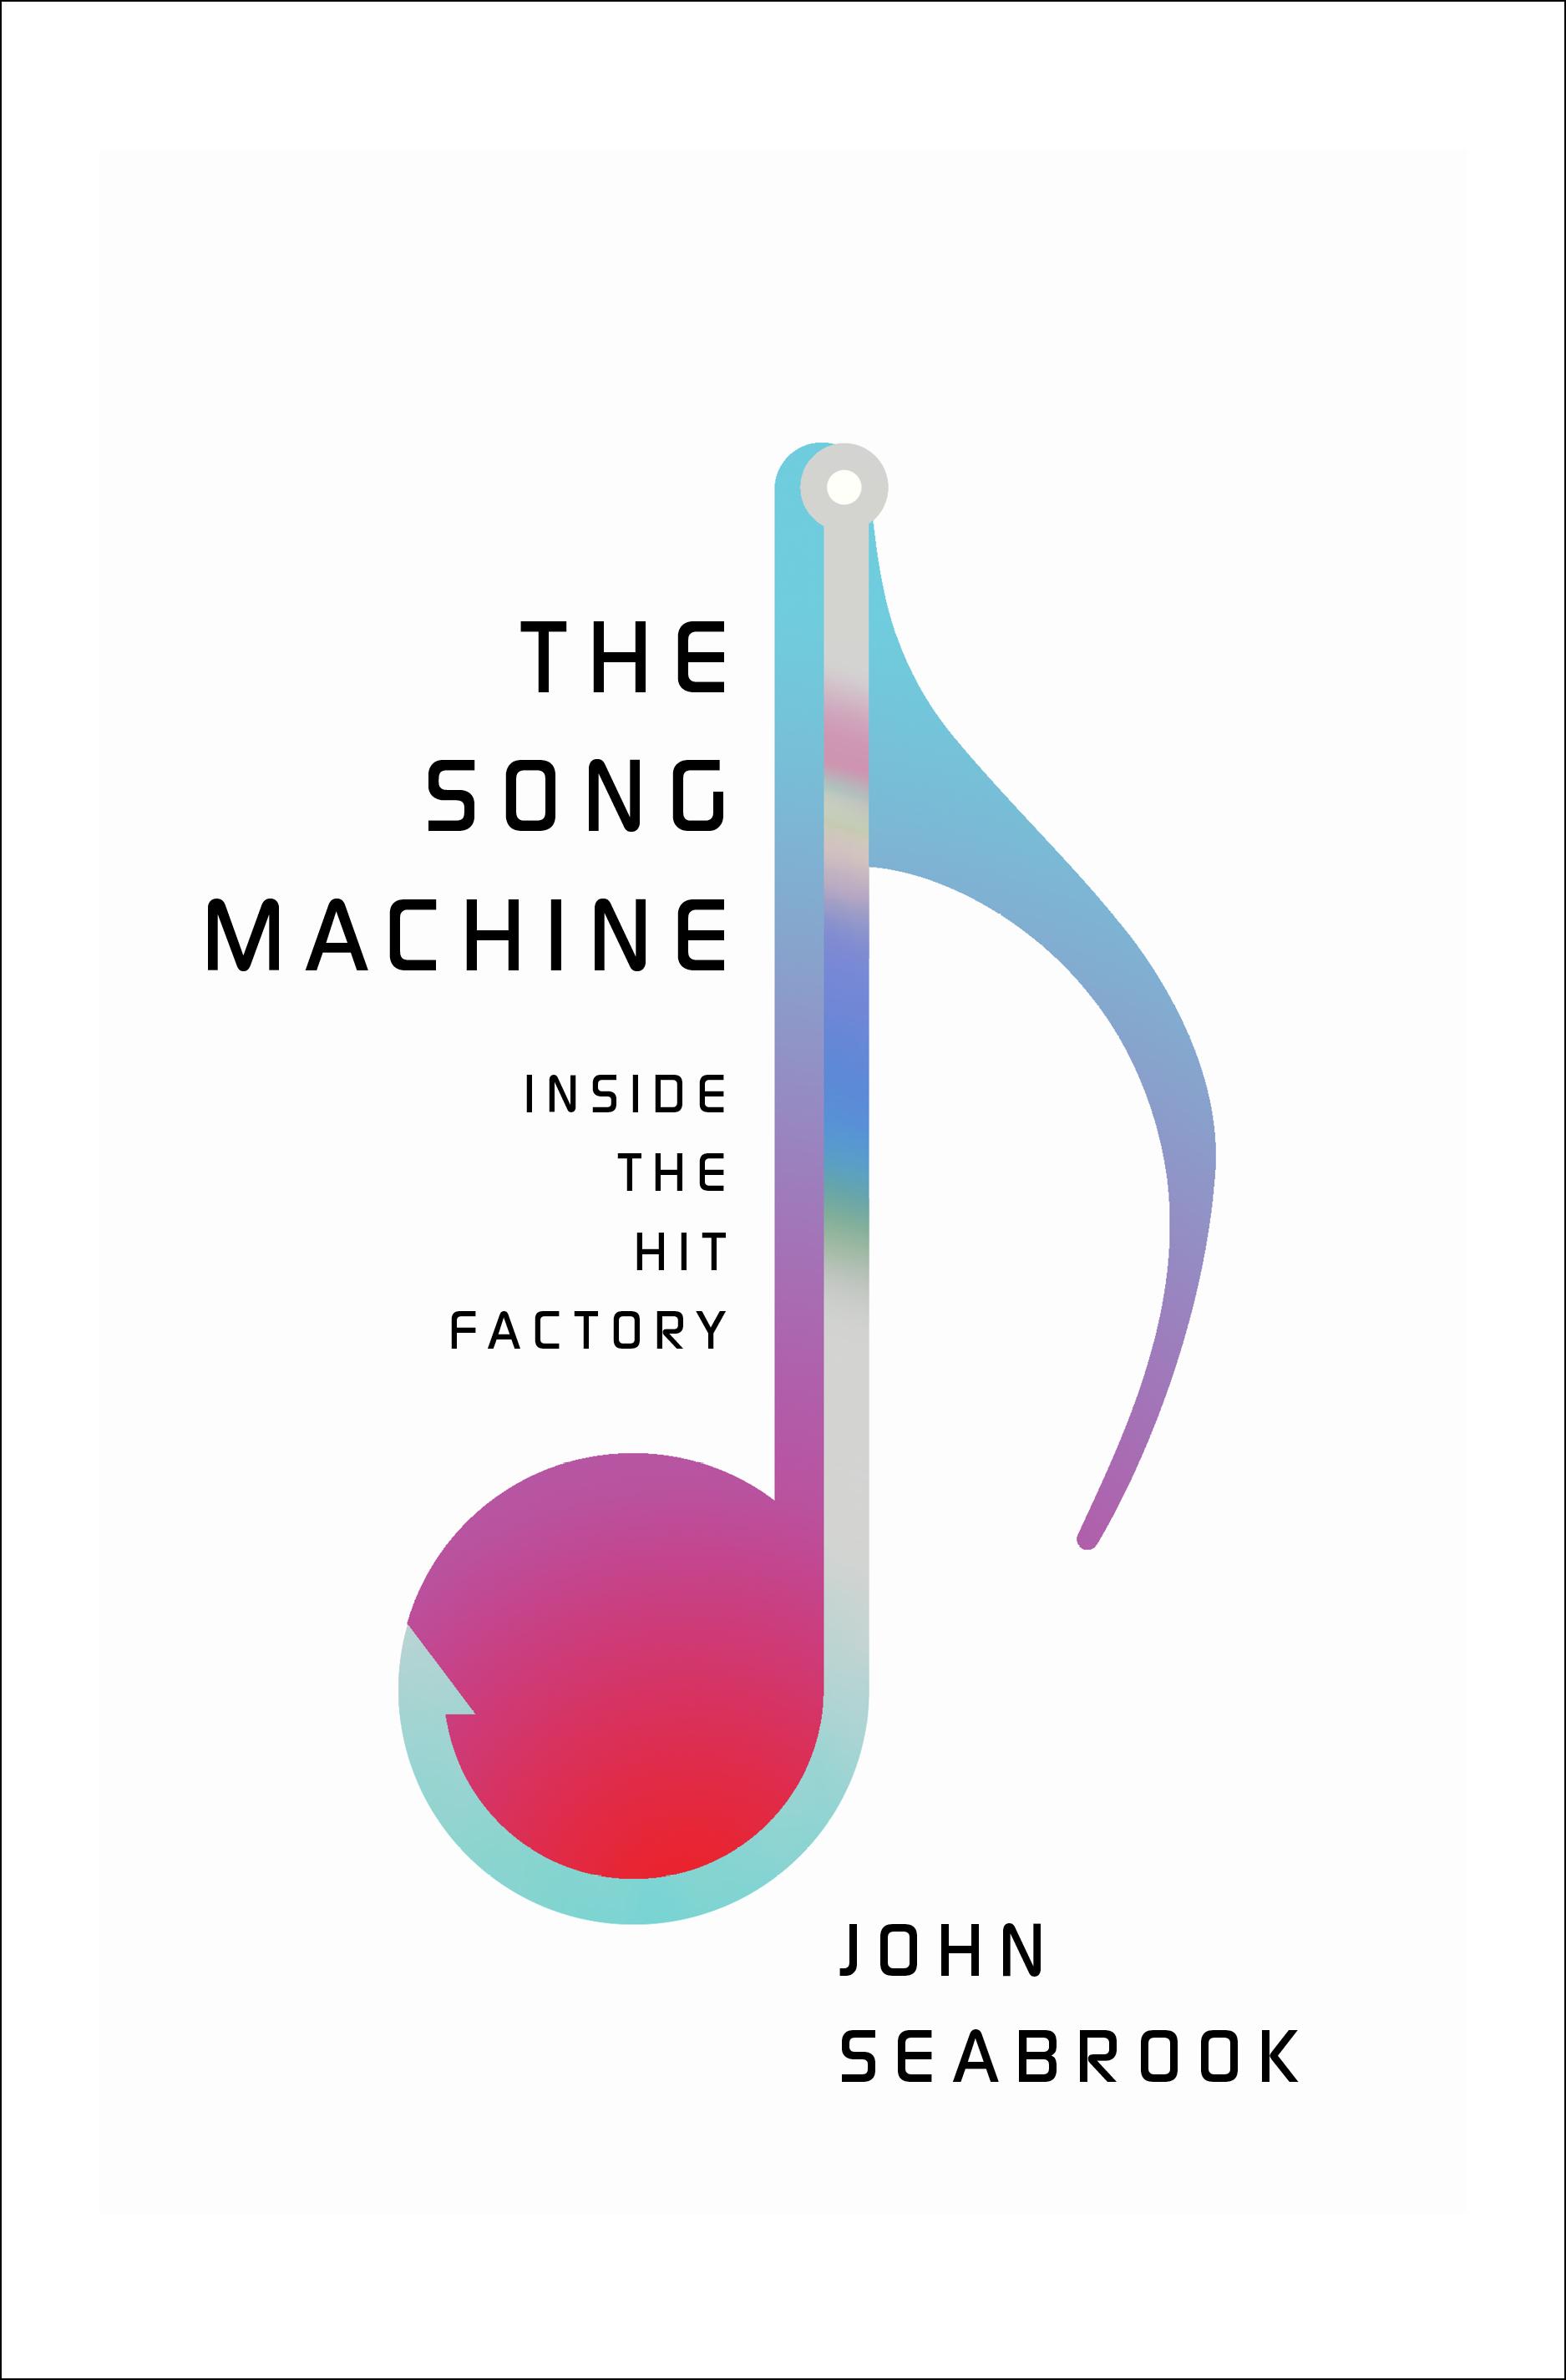 the-song-machine-john-seabrook-rihanna-umbrella